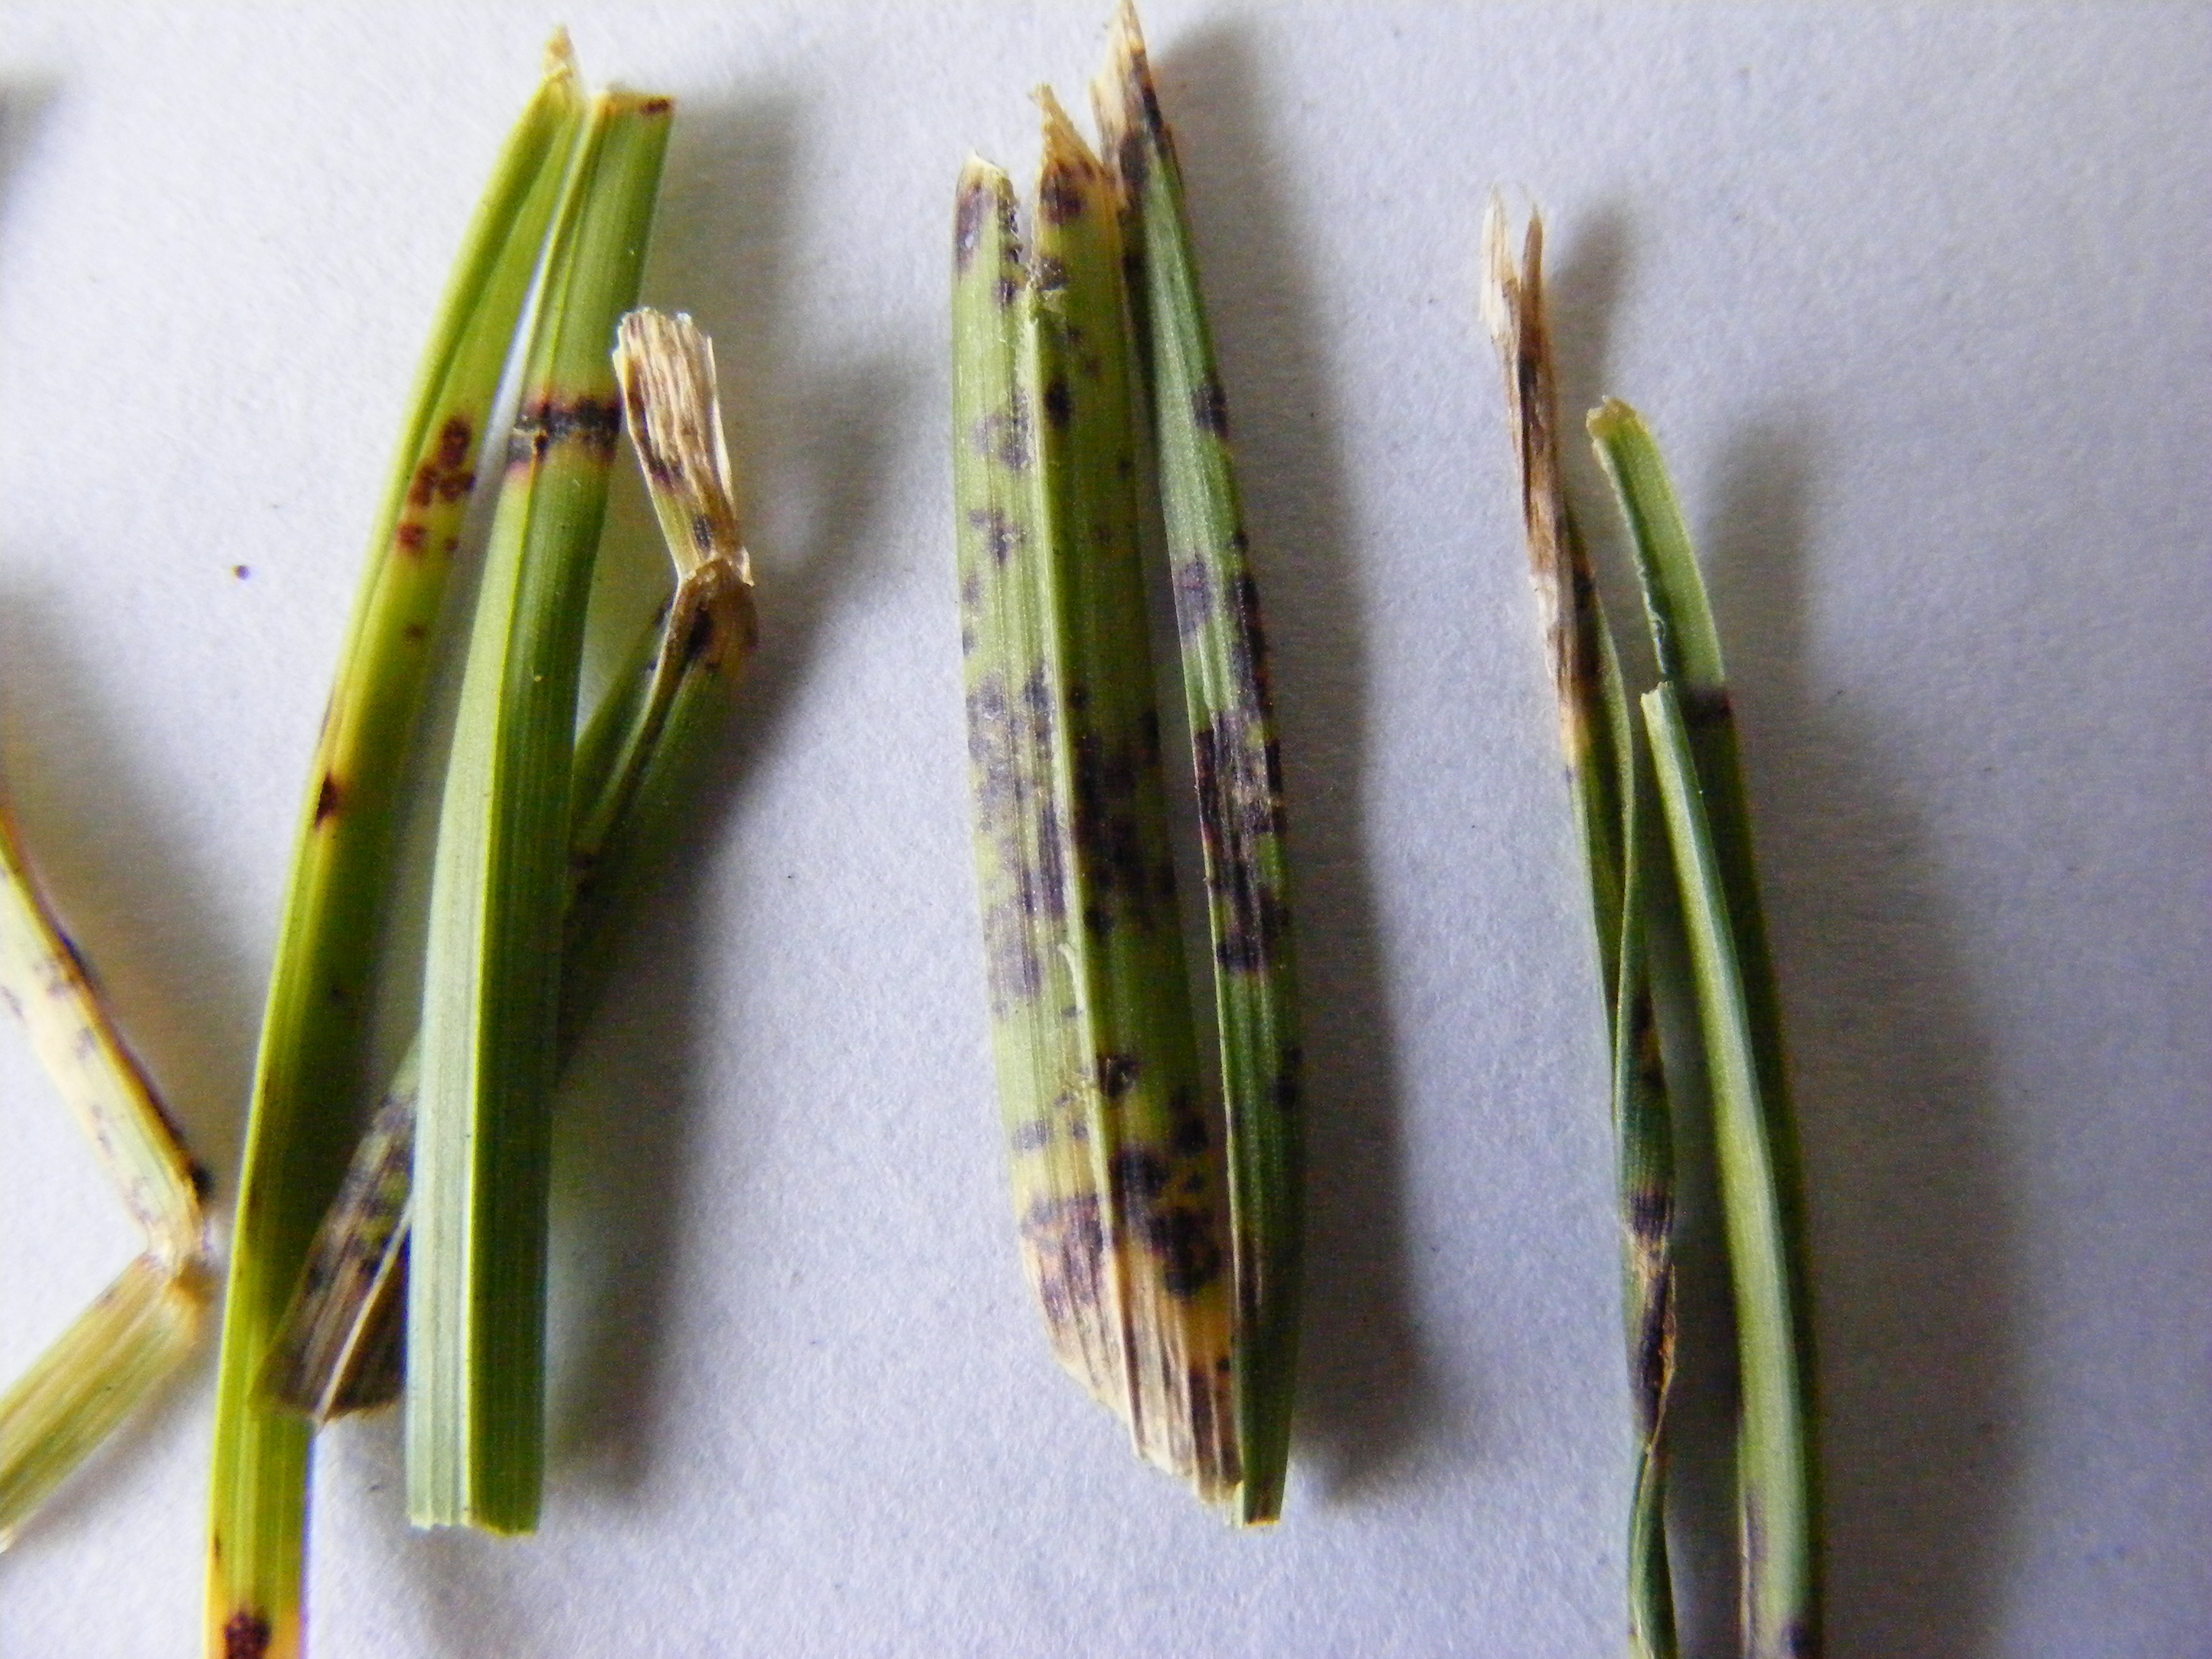 Blattflecken (Drechslera spp., Bipolaris spp., Curvularia spp.)